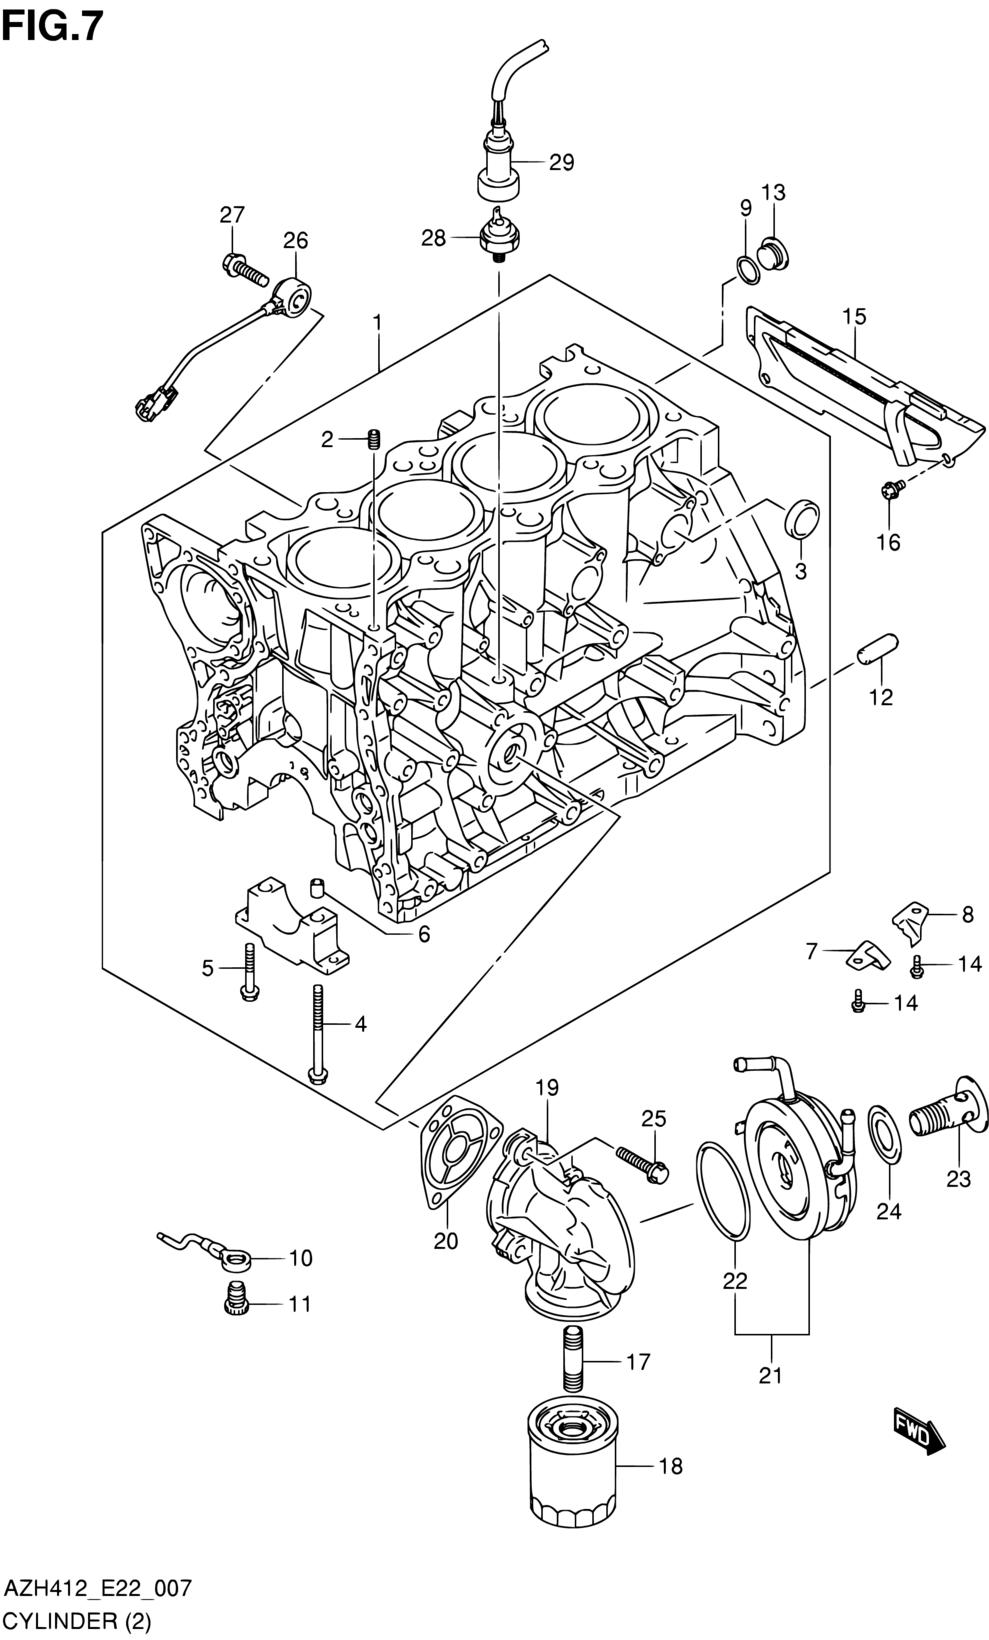 E38 Cylinder Diagram Electrical Wiring Diagrams Honda Middle East Swift Azh414 E05e06e24e30e35e38 Lubrication 7 97 Accord Clutch Pedal